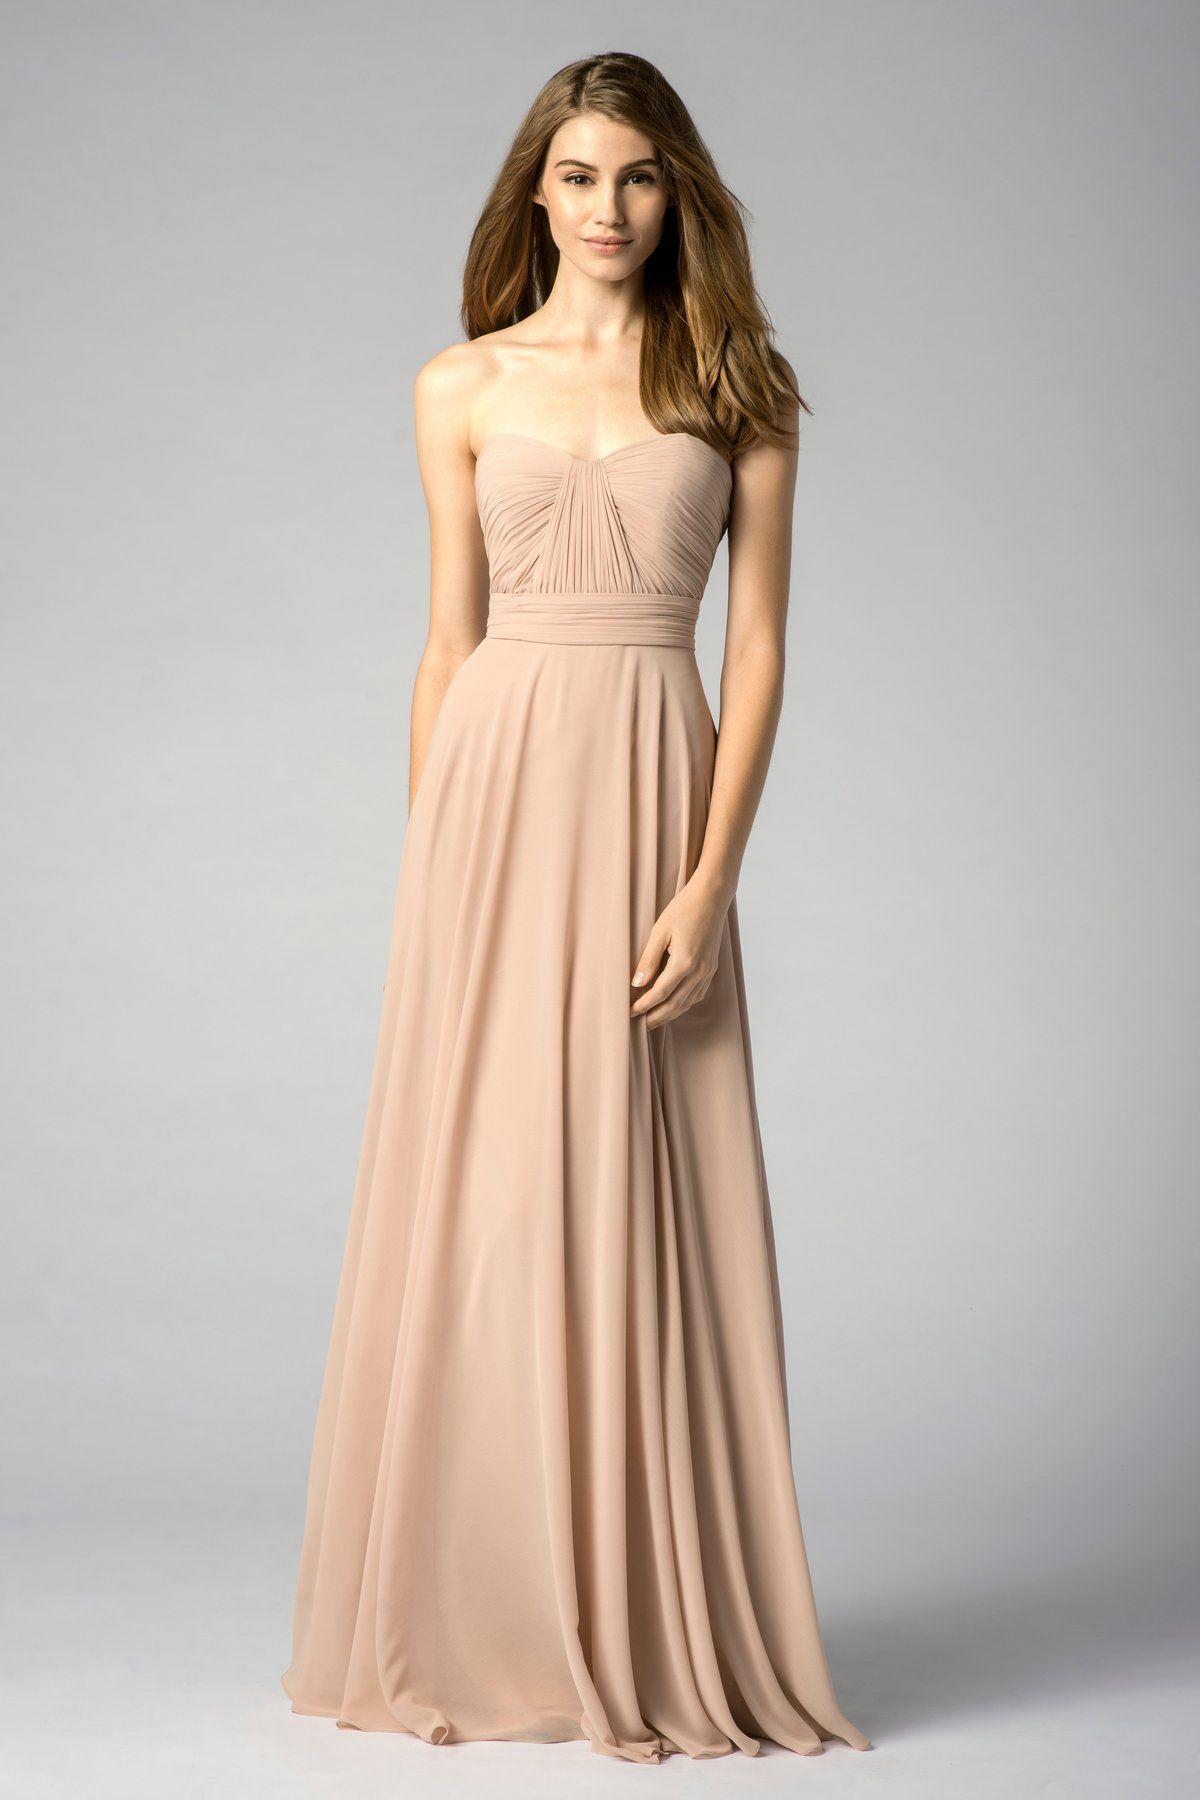 Rent your wedding dress  Champagne Chiffon Bridesmaid Dress Bwawishesbridal